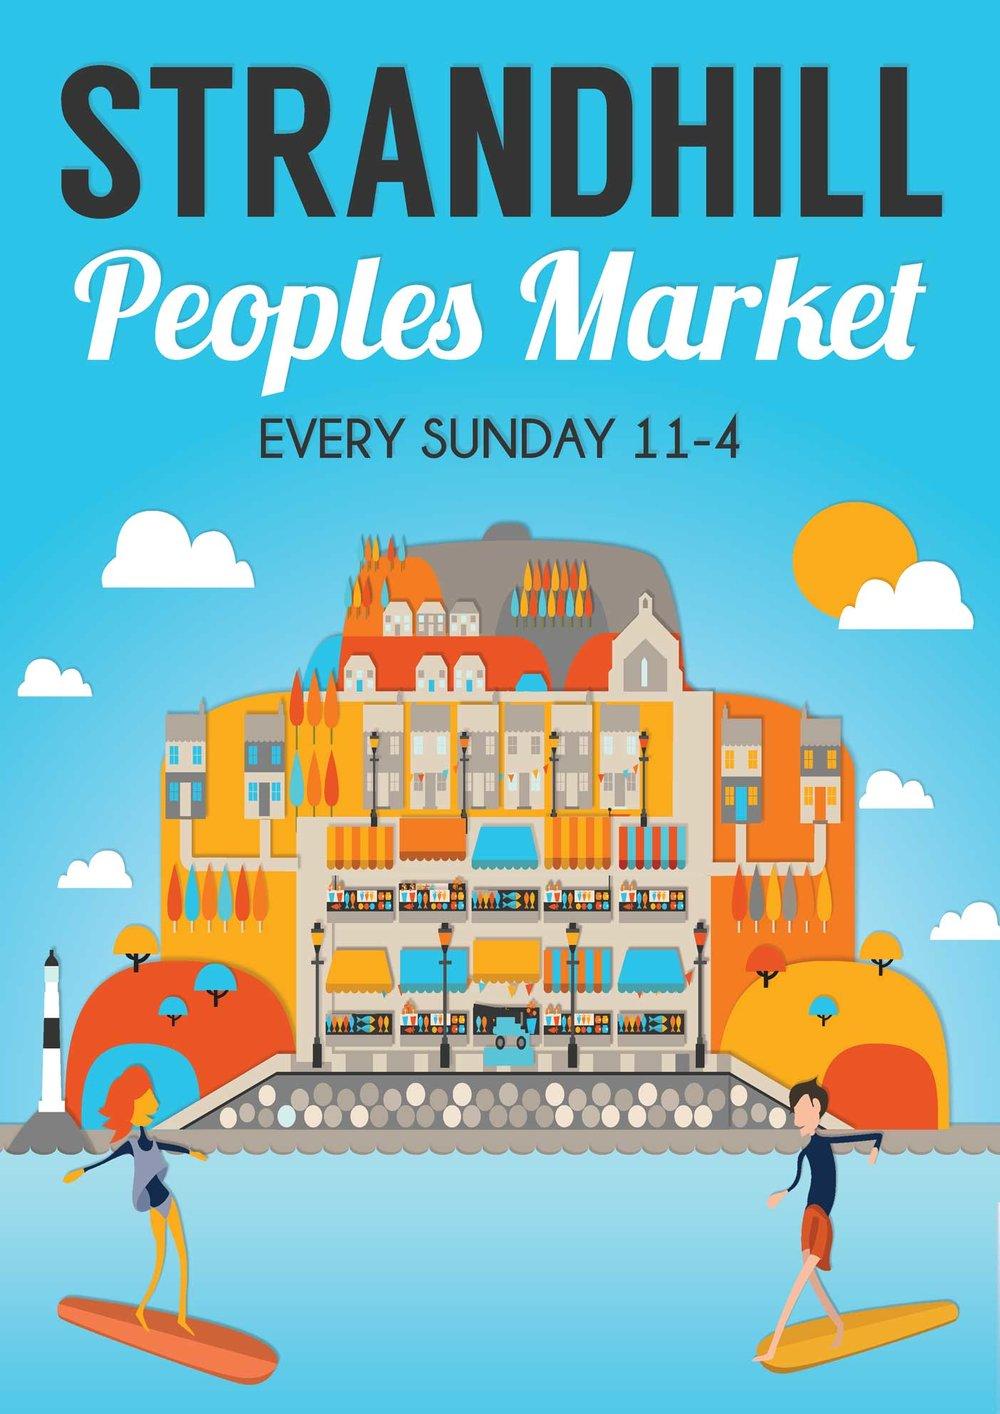 Reddin Designs illustration Strandhill-peoples-market-poster.jpg